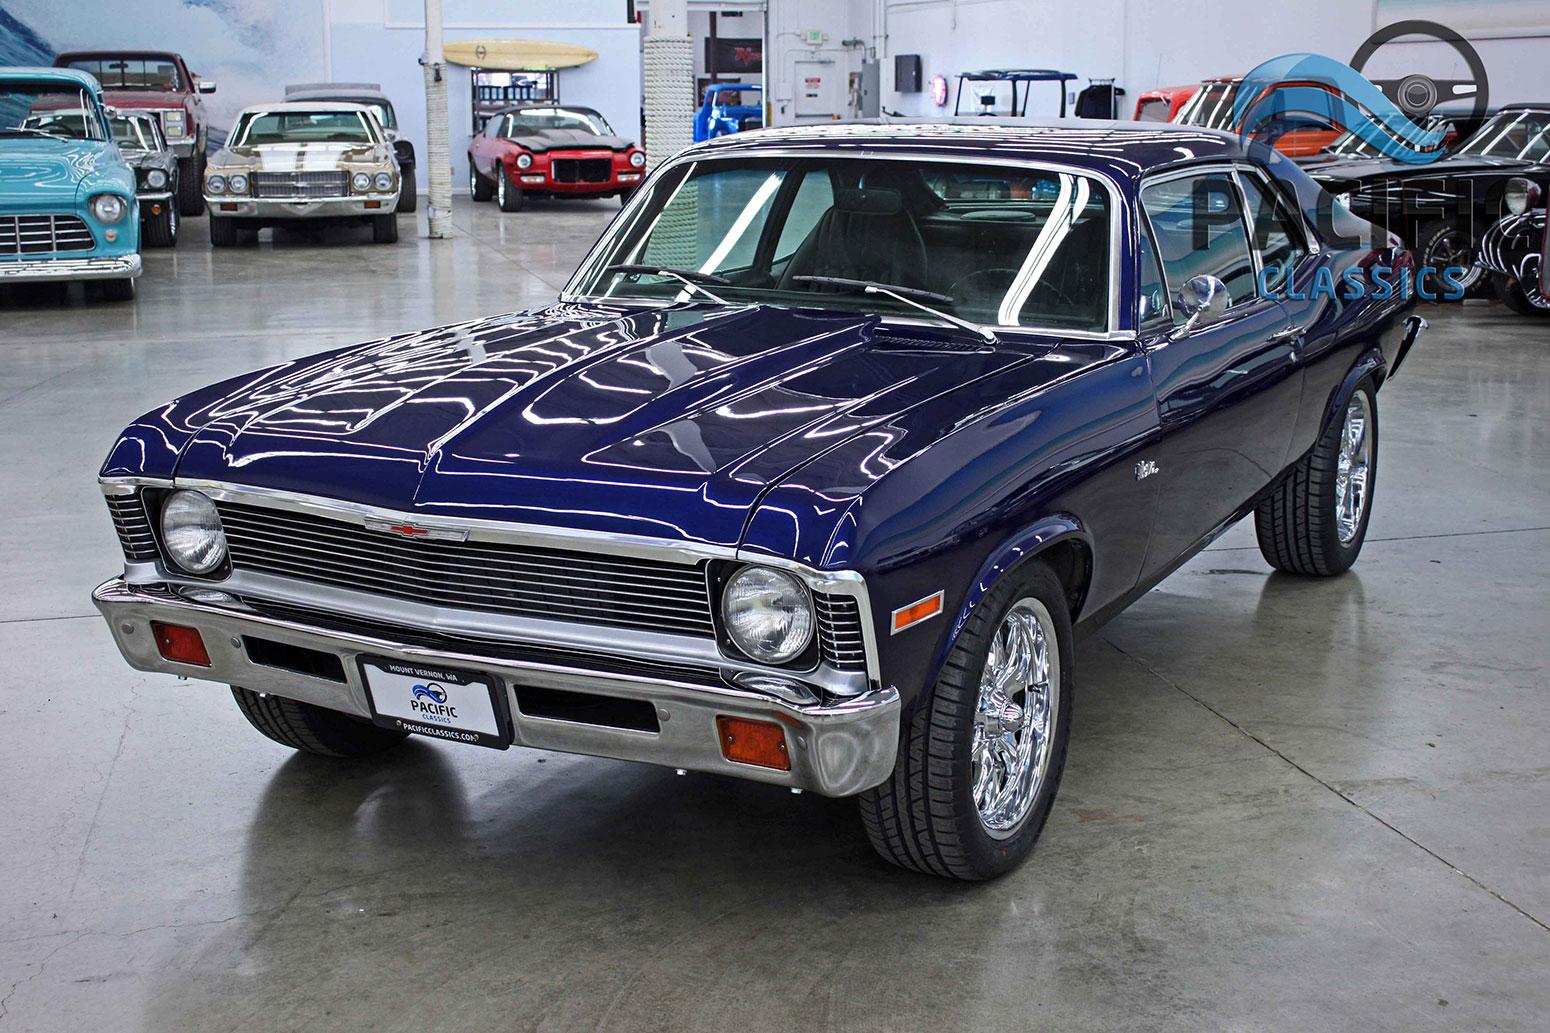 1972 Chevrolet Nova Blue